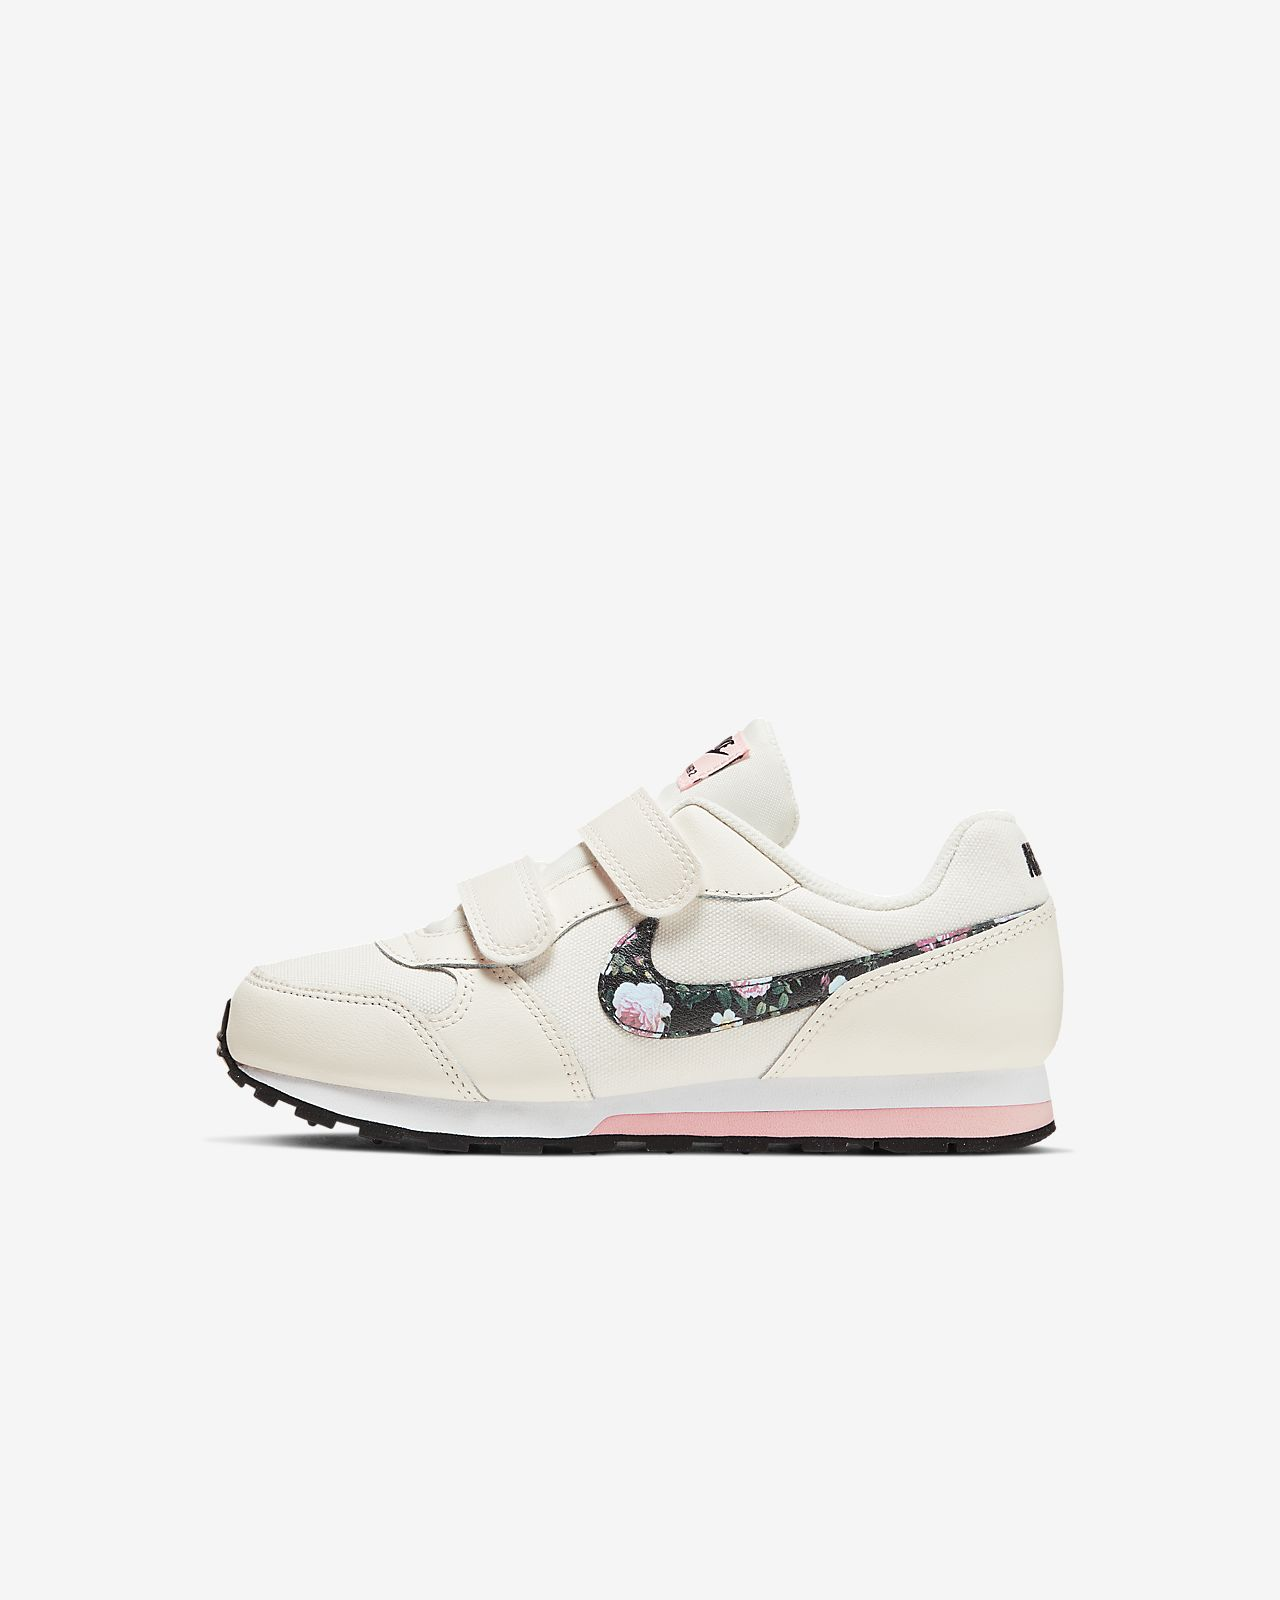 Calzado para niños talla pequeña Nike MD Runner 2 Vintage Floral